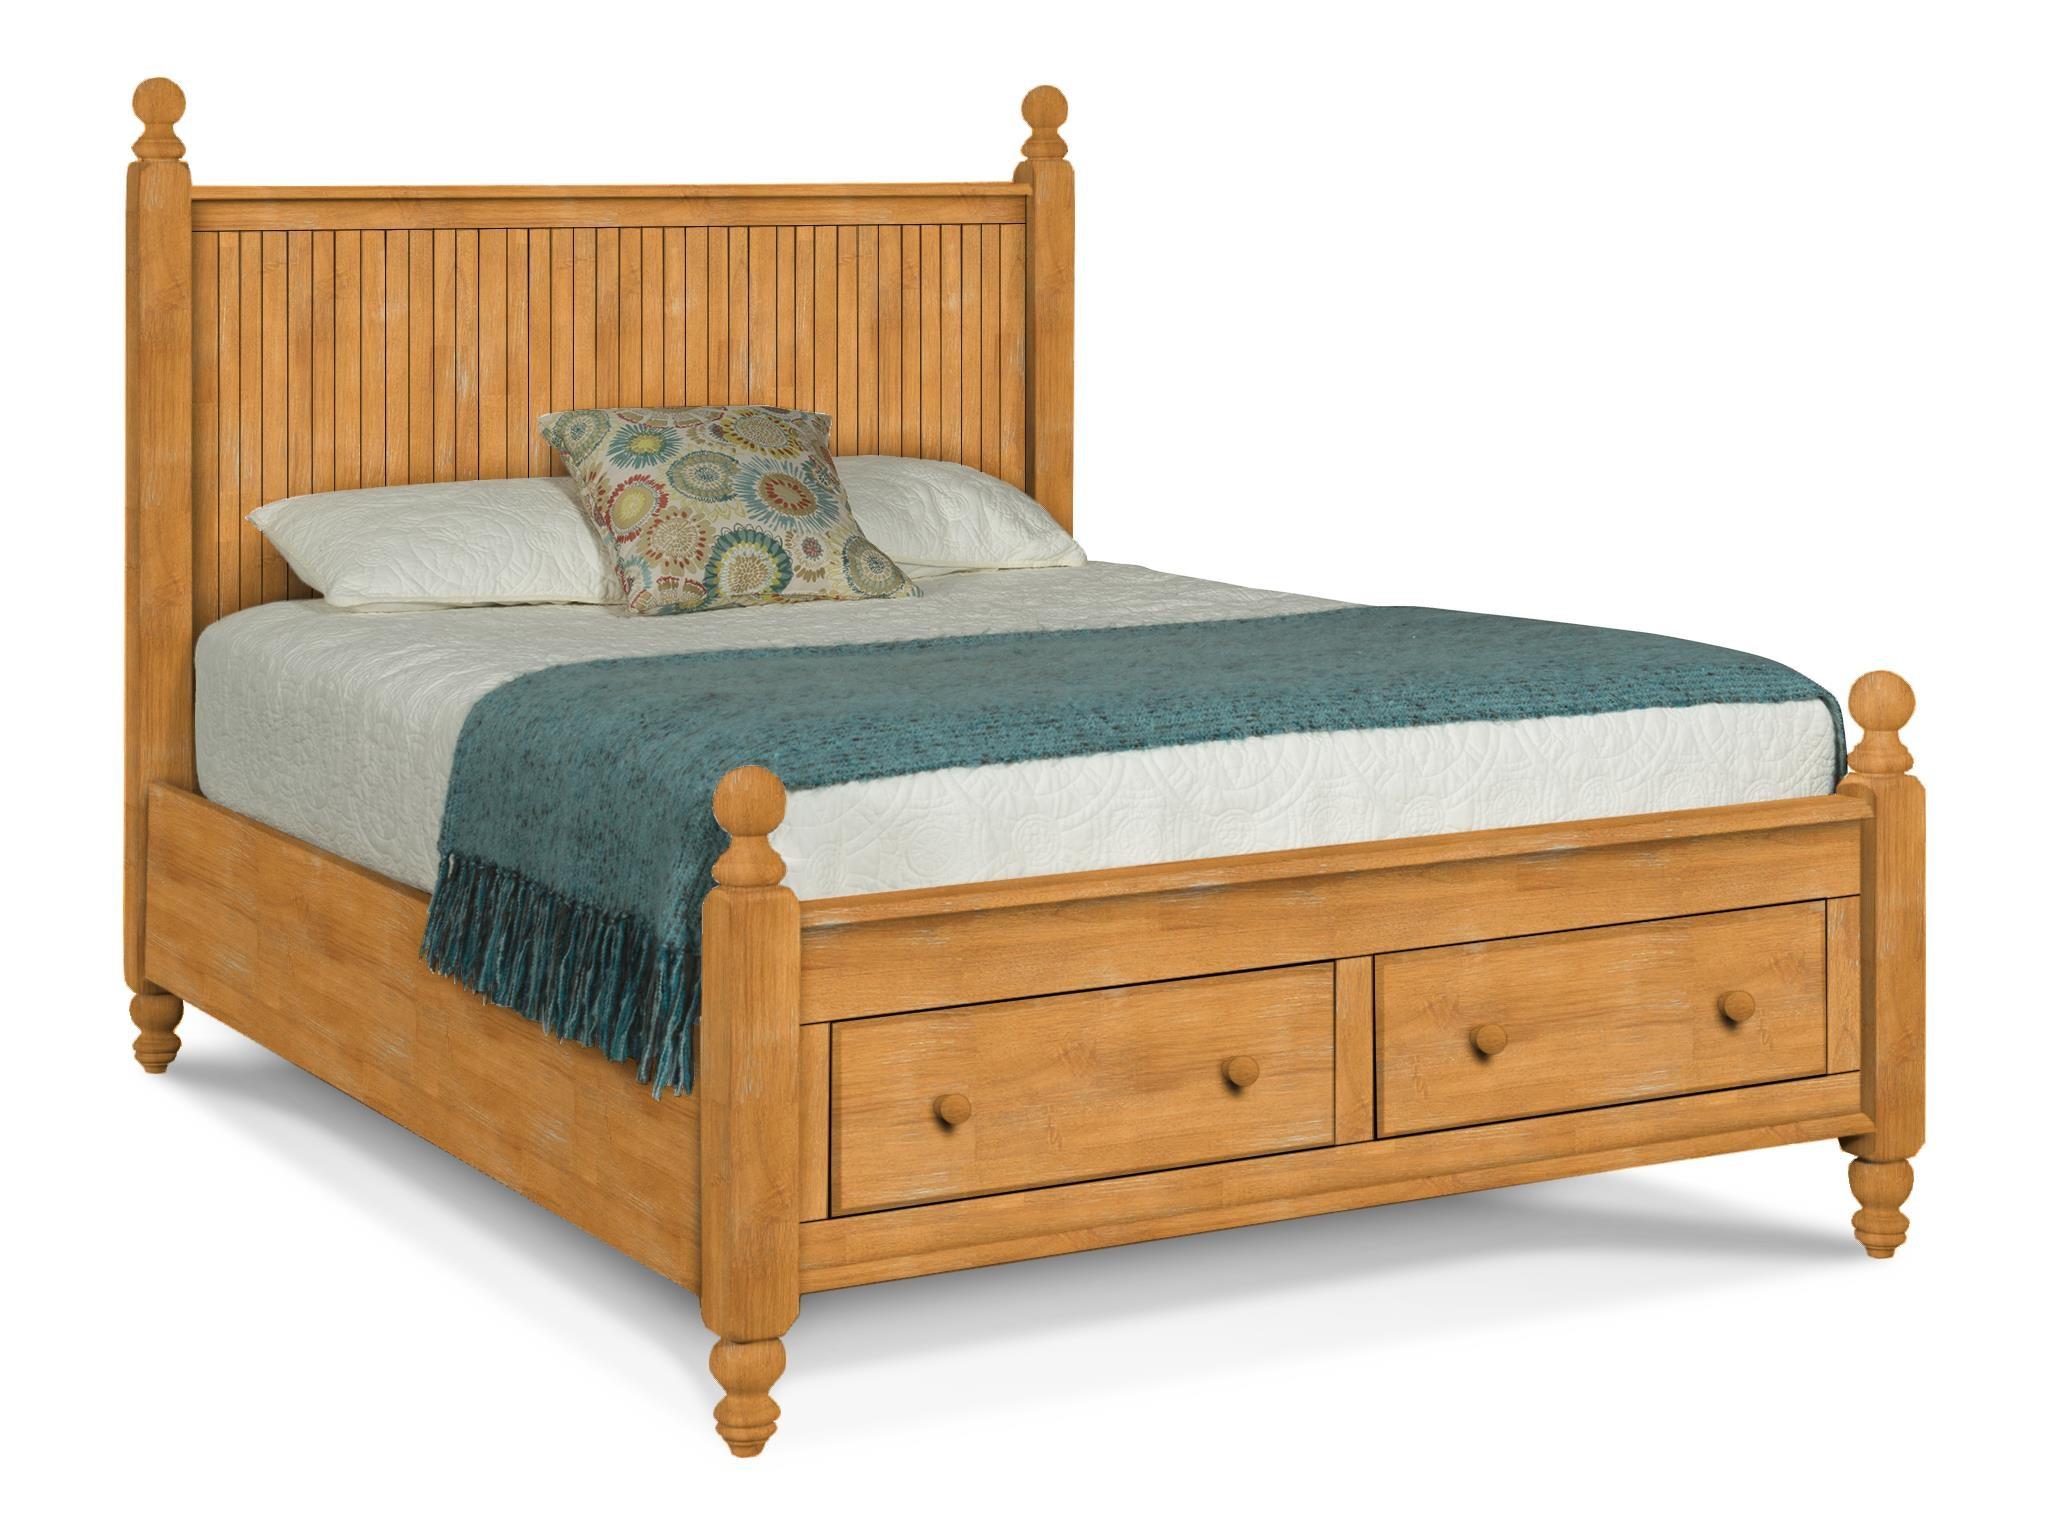 Queen Cottage Storage Bed BD-202QH / BD-202QF / BD-202QD / BD-202QR